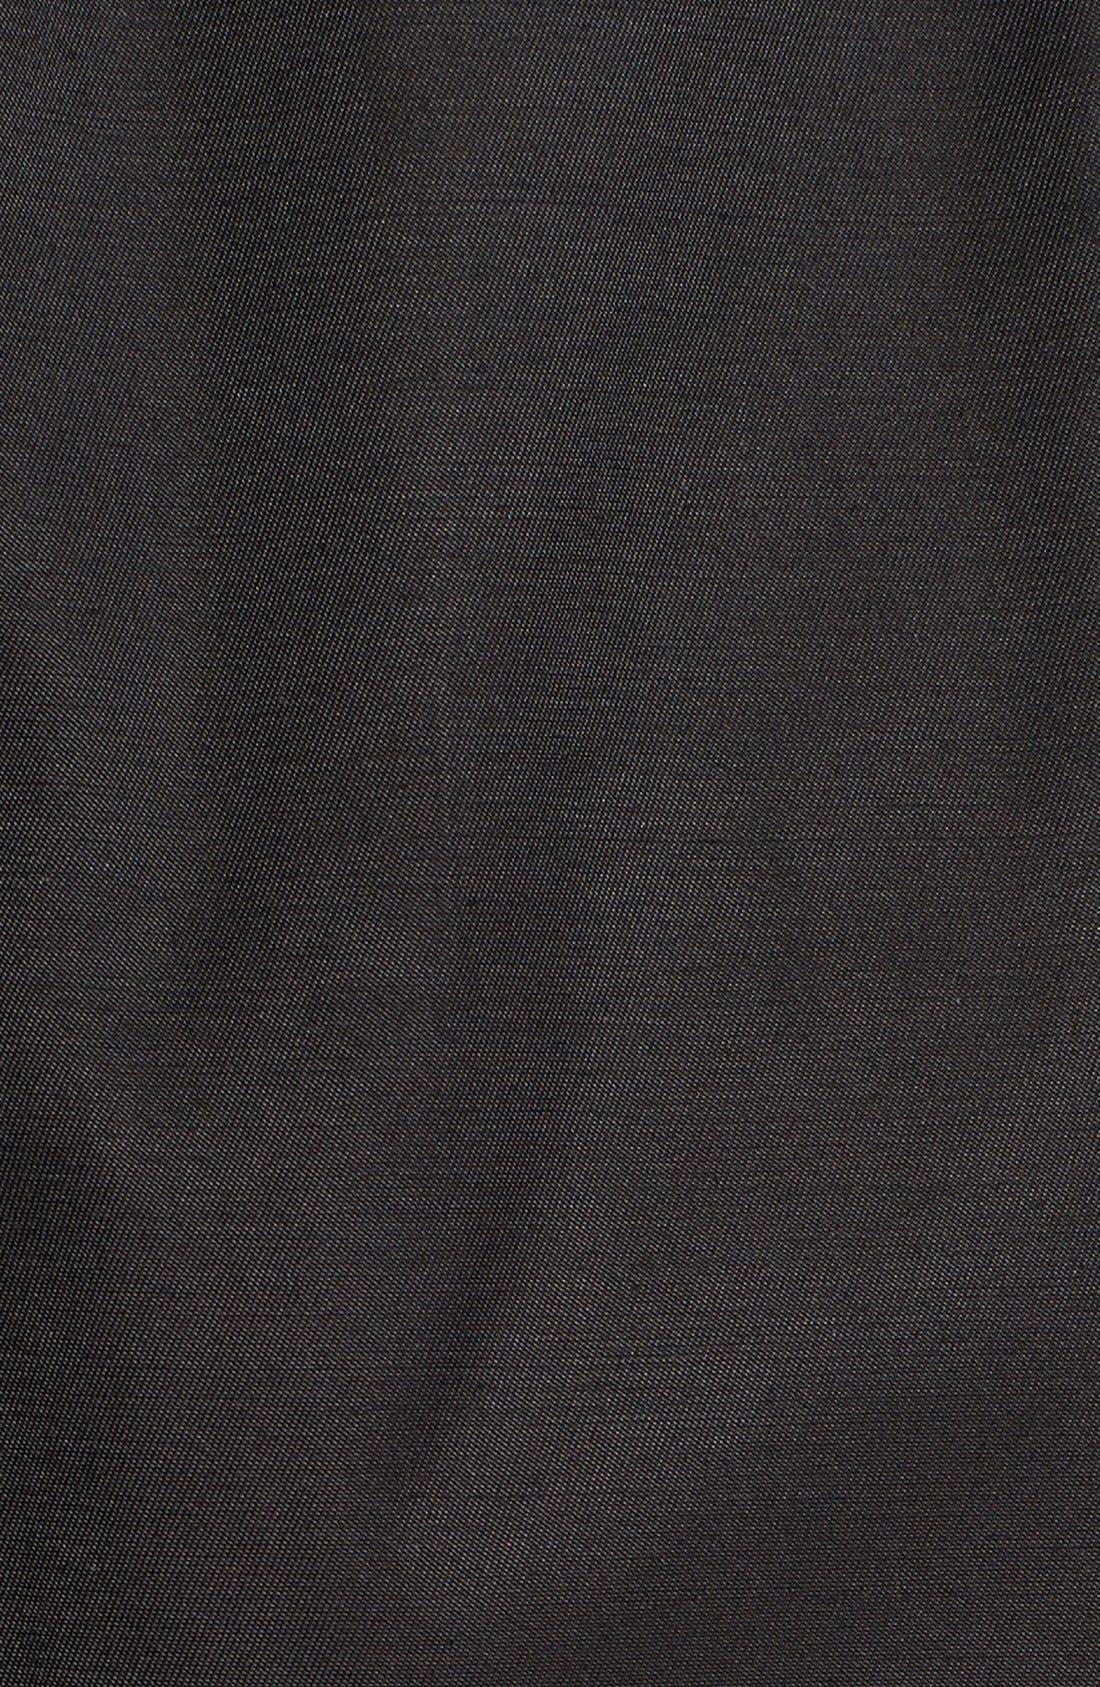 Alternate Image 5  - London Fog Hooded Double Breasted Trench Coat (Regular & Petite)